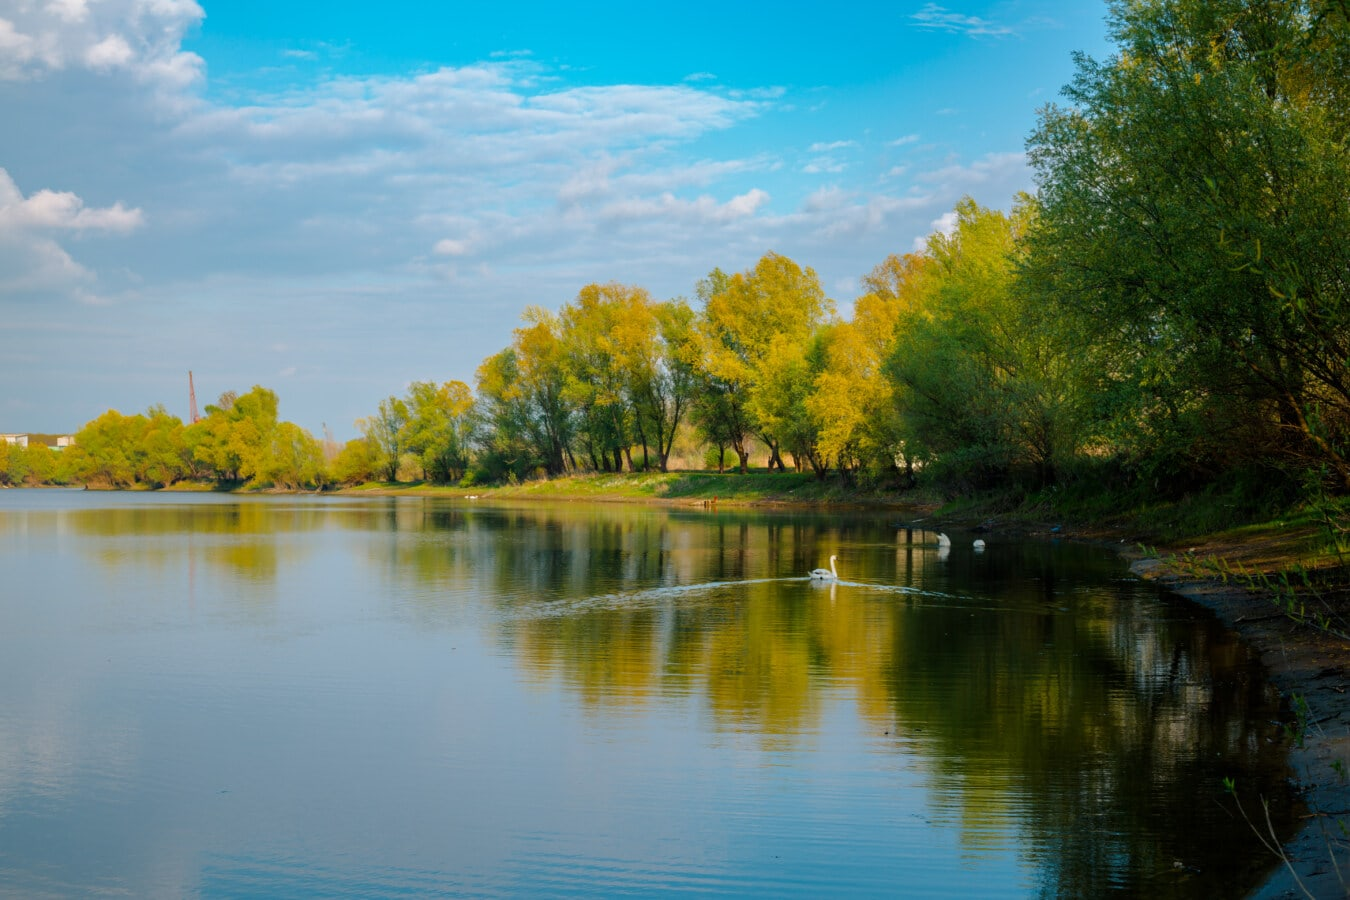 nature, lake, lakeside, landscape, swan, summer time, majestic, blue sky, national park, idyllic